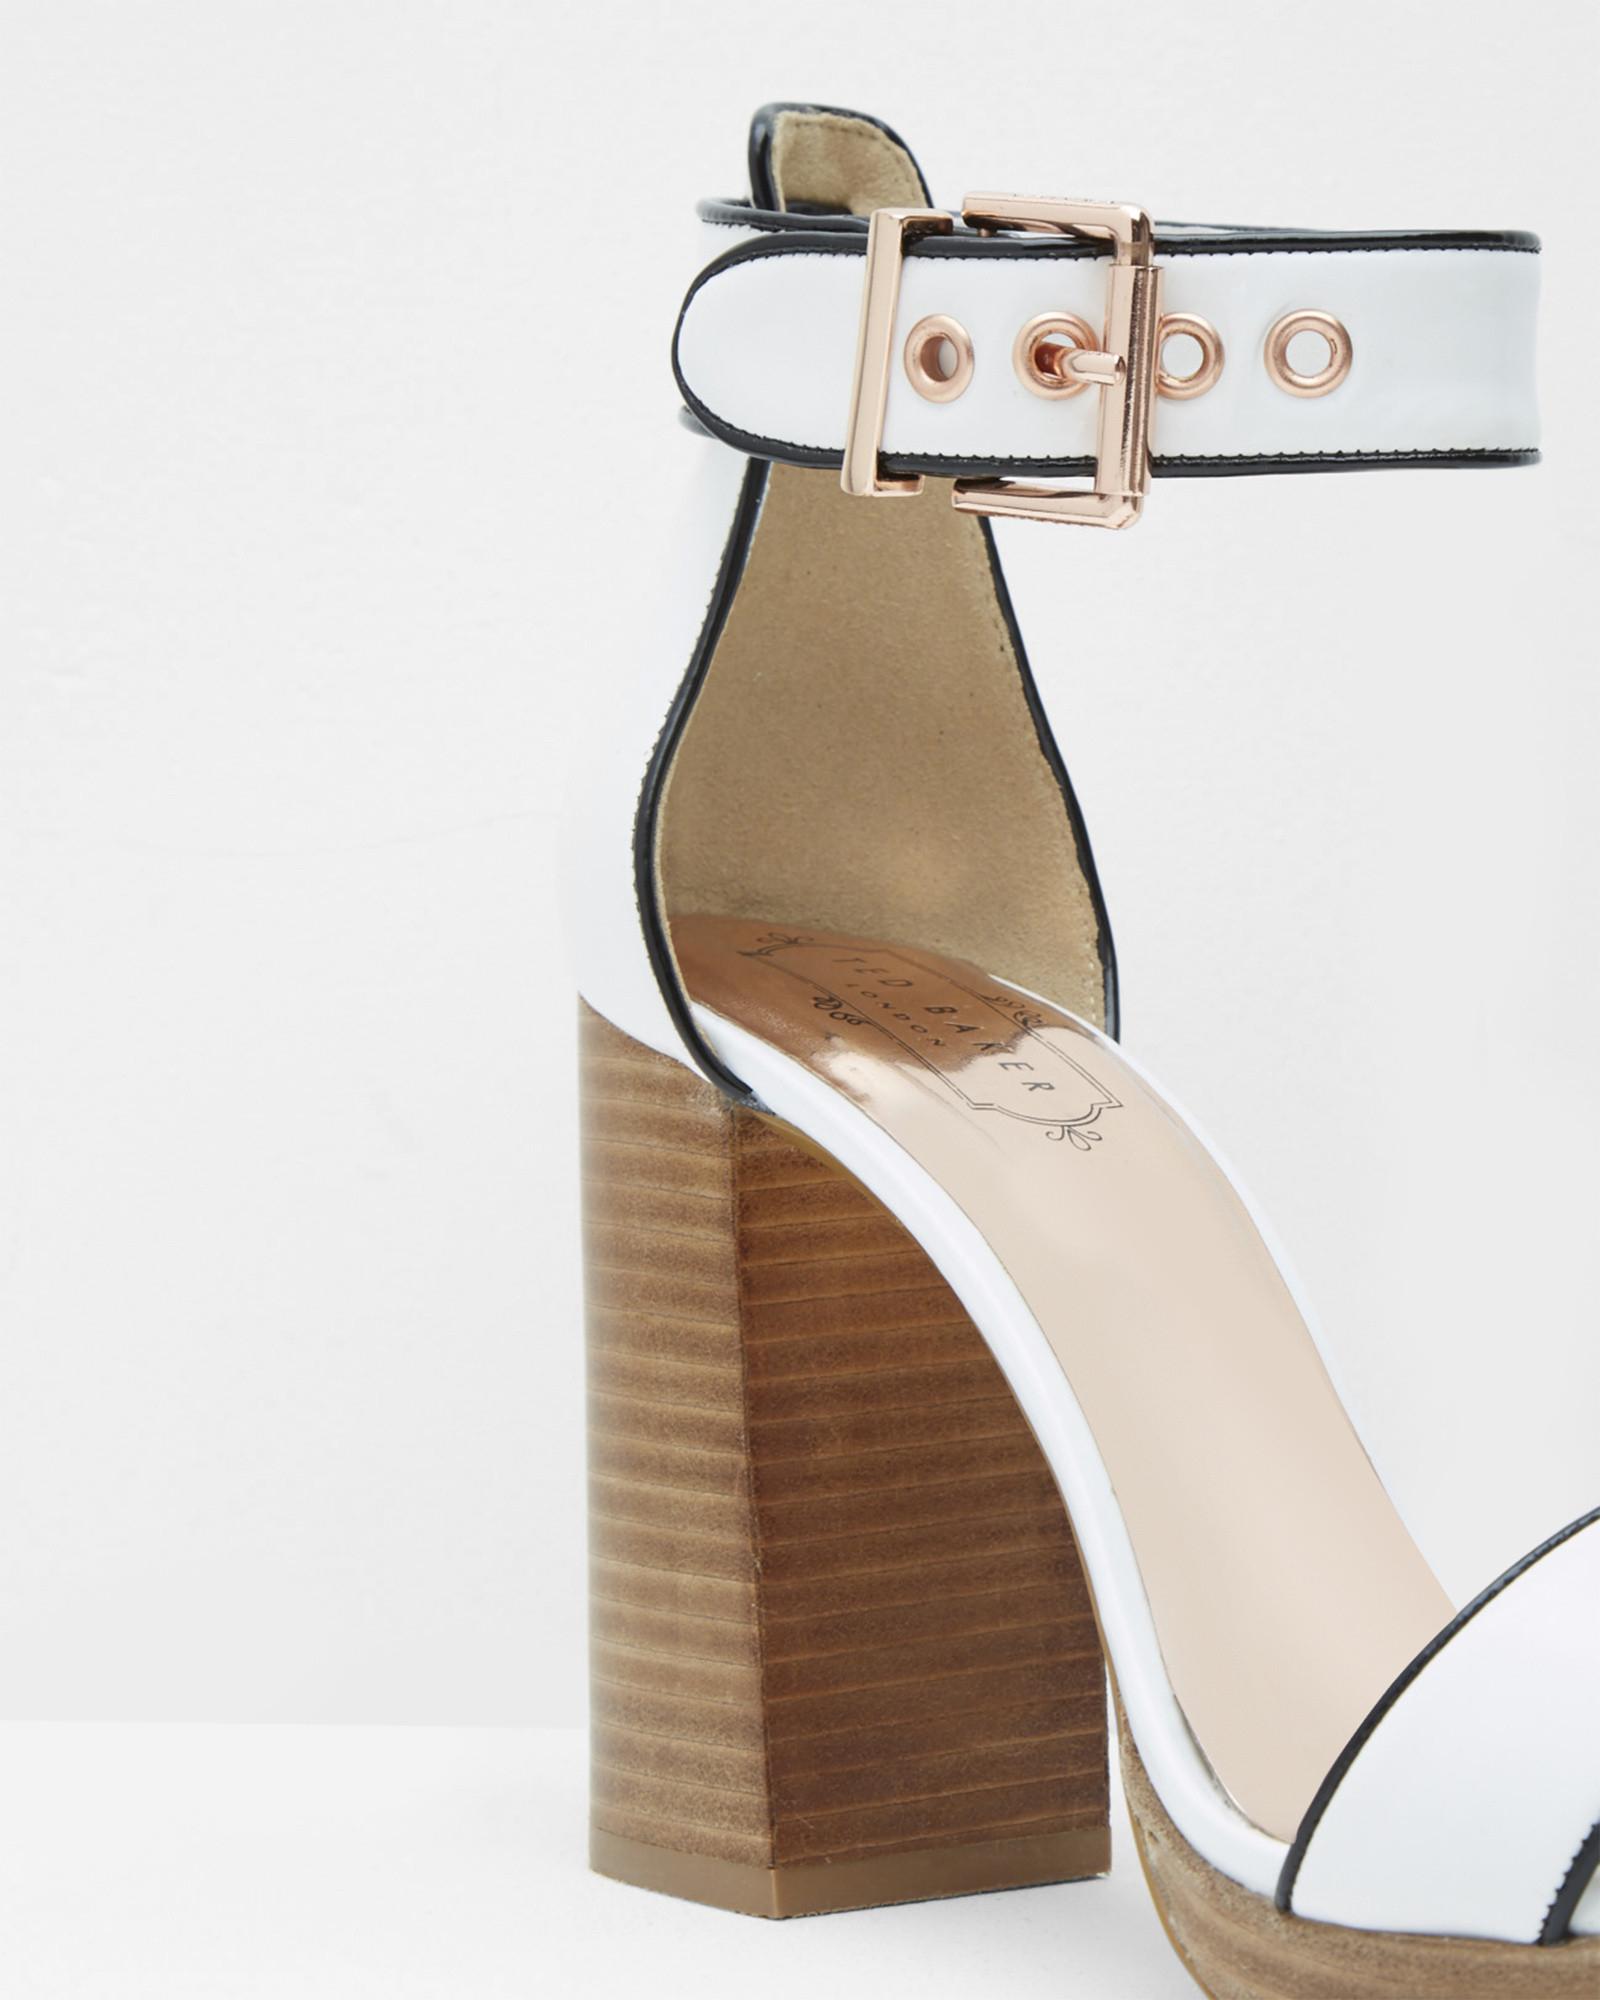 2edae1cb00c6 Ted Baker Open Toe Block Heeled Platform Sandals in White - Lyst